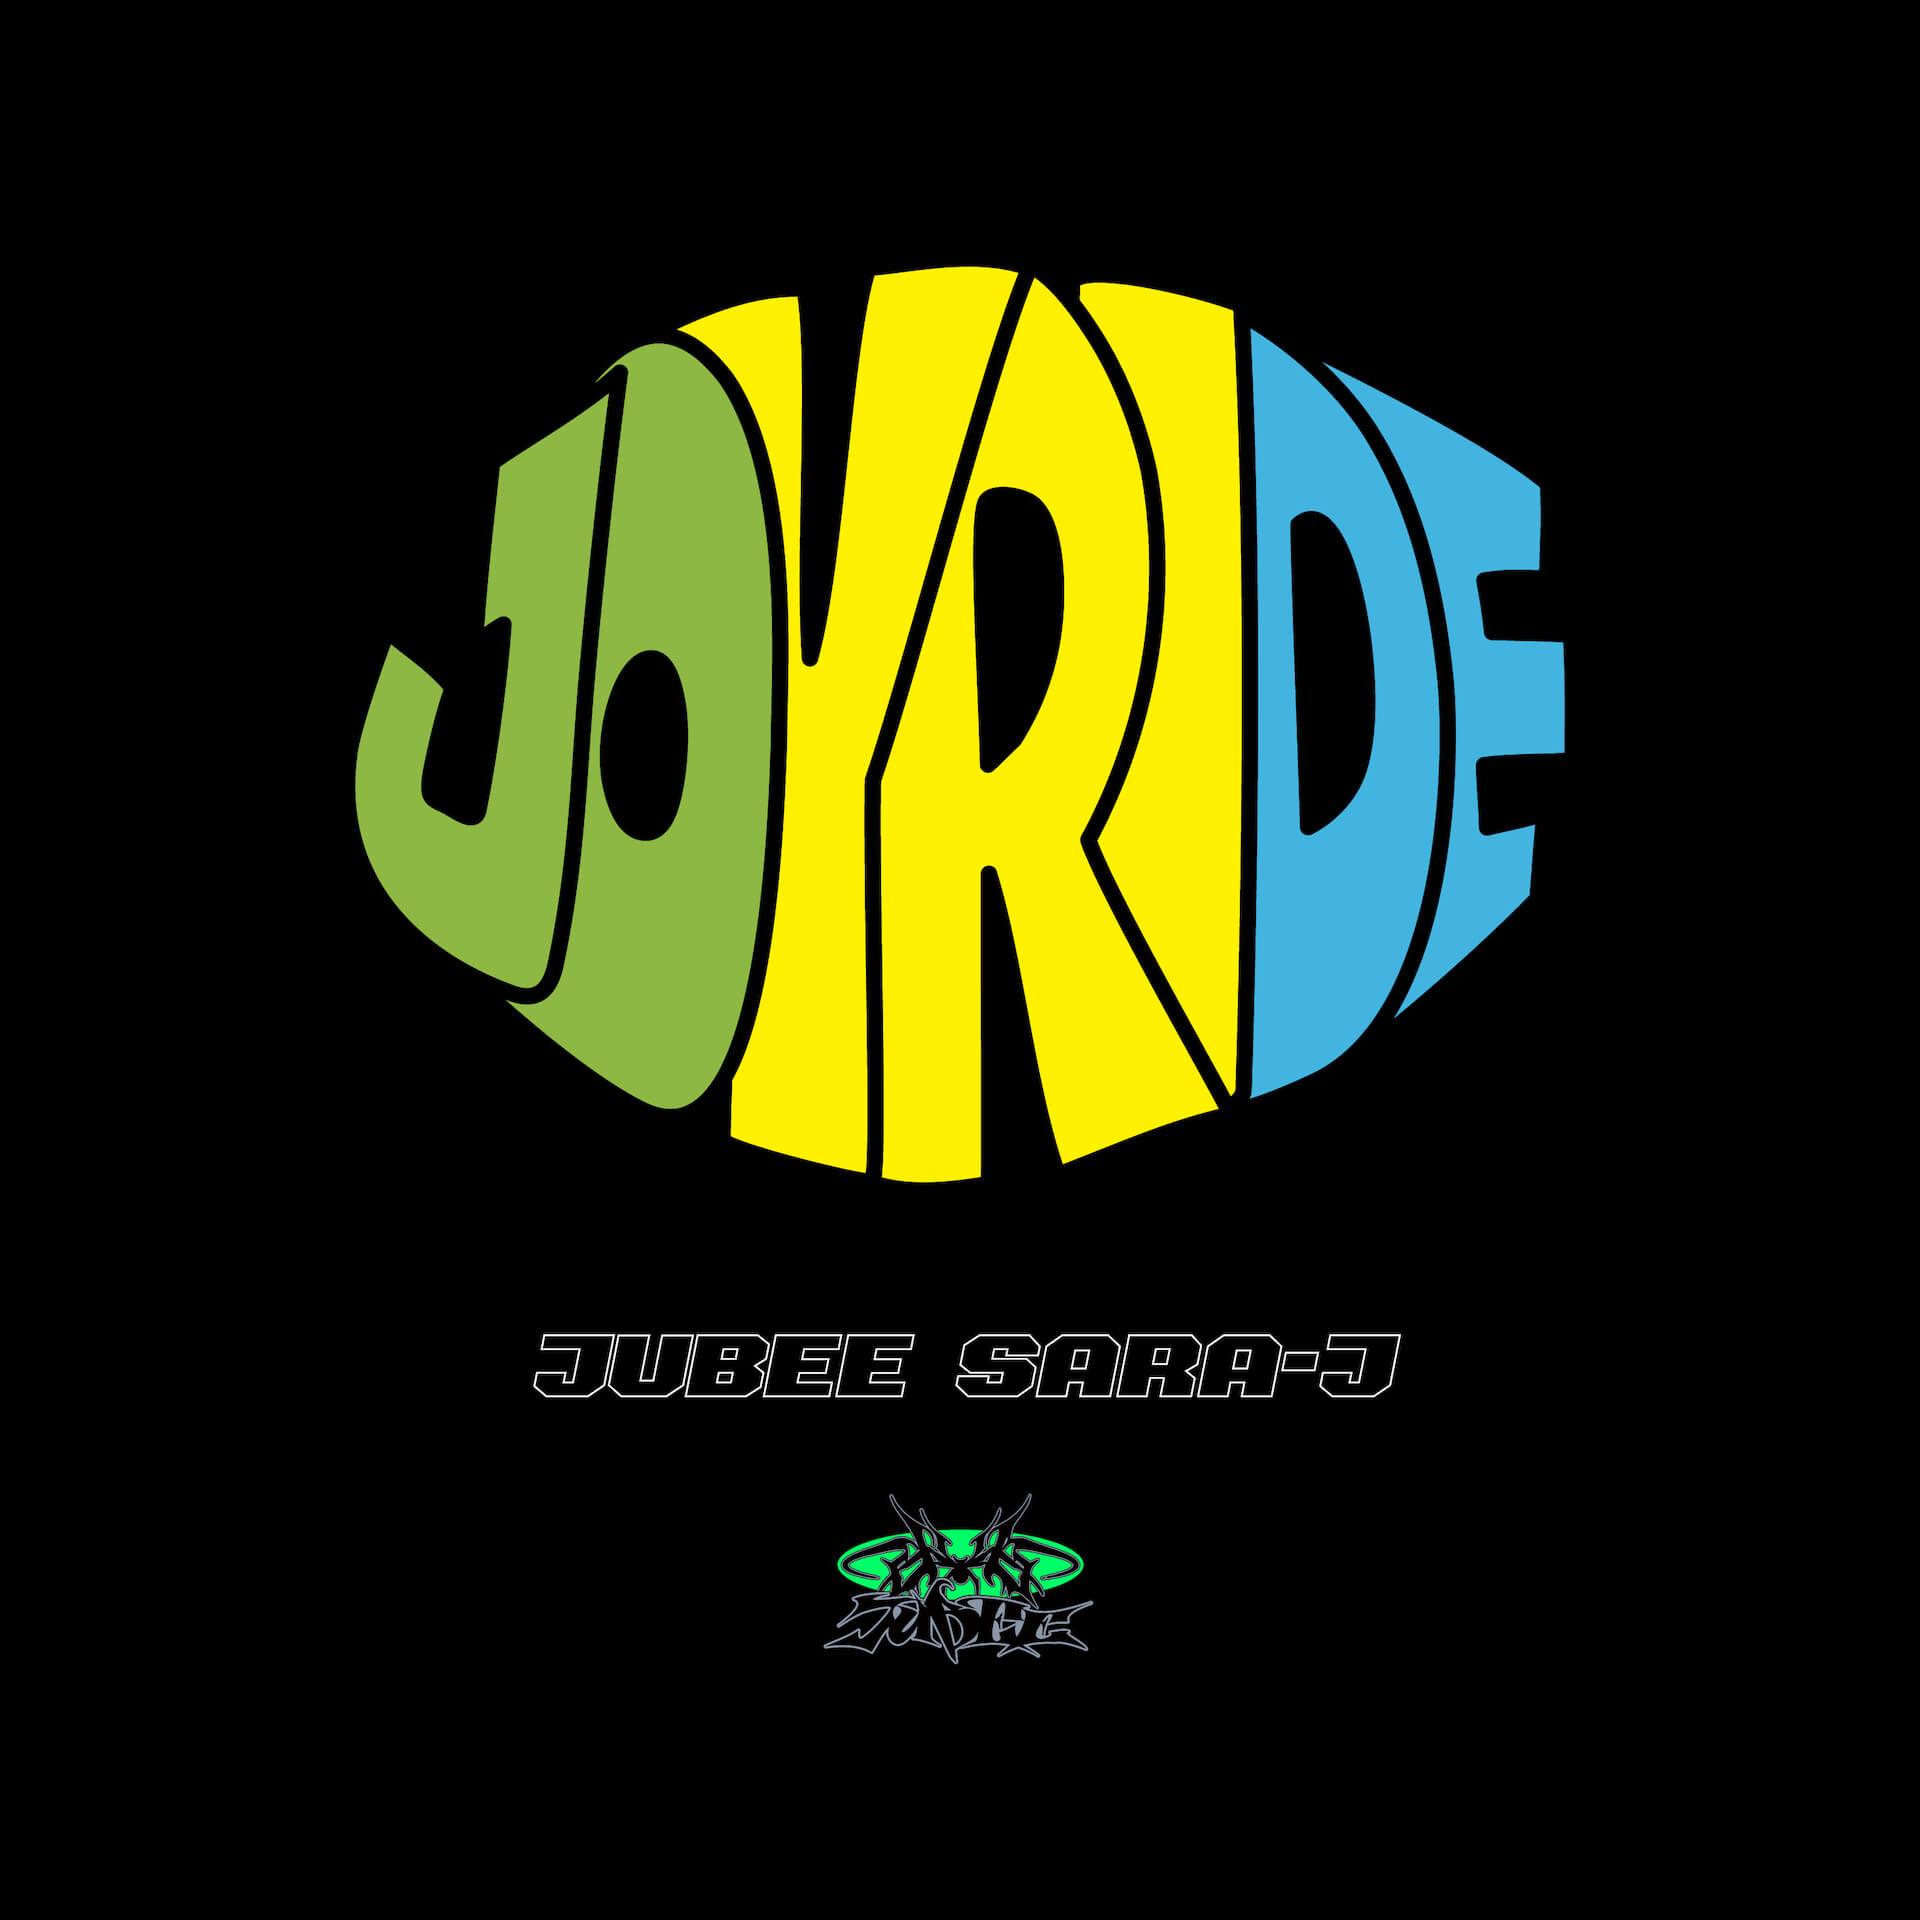 "CreativeDrugStoreのメンバーJUBEEがSARA-Jを客演に迎えて新曲""Joyride feat. SARA-J""をリリース! music200403_jubee_01"